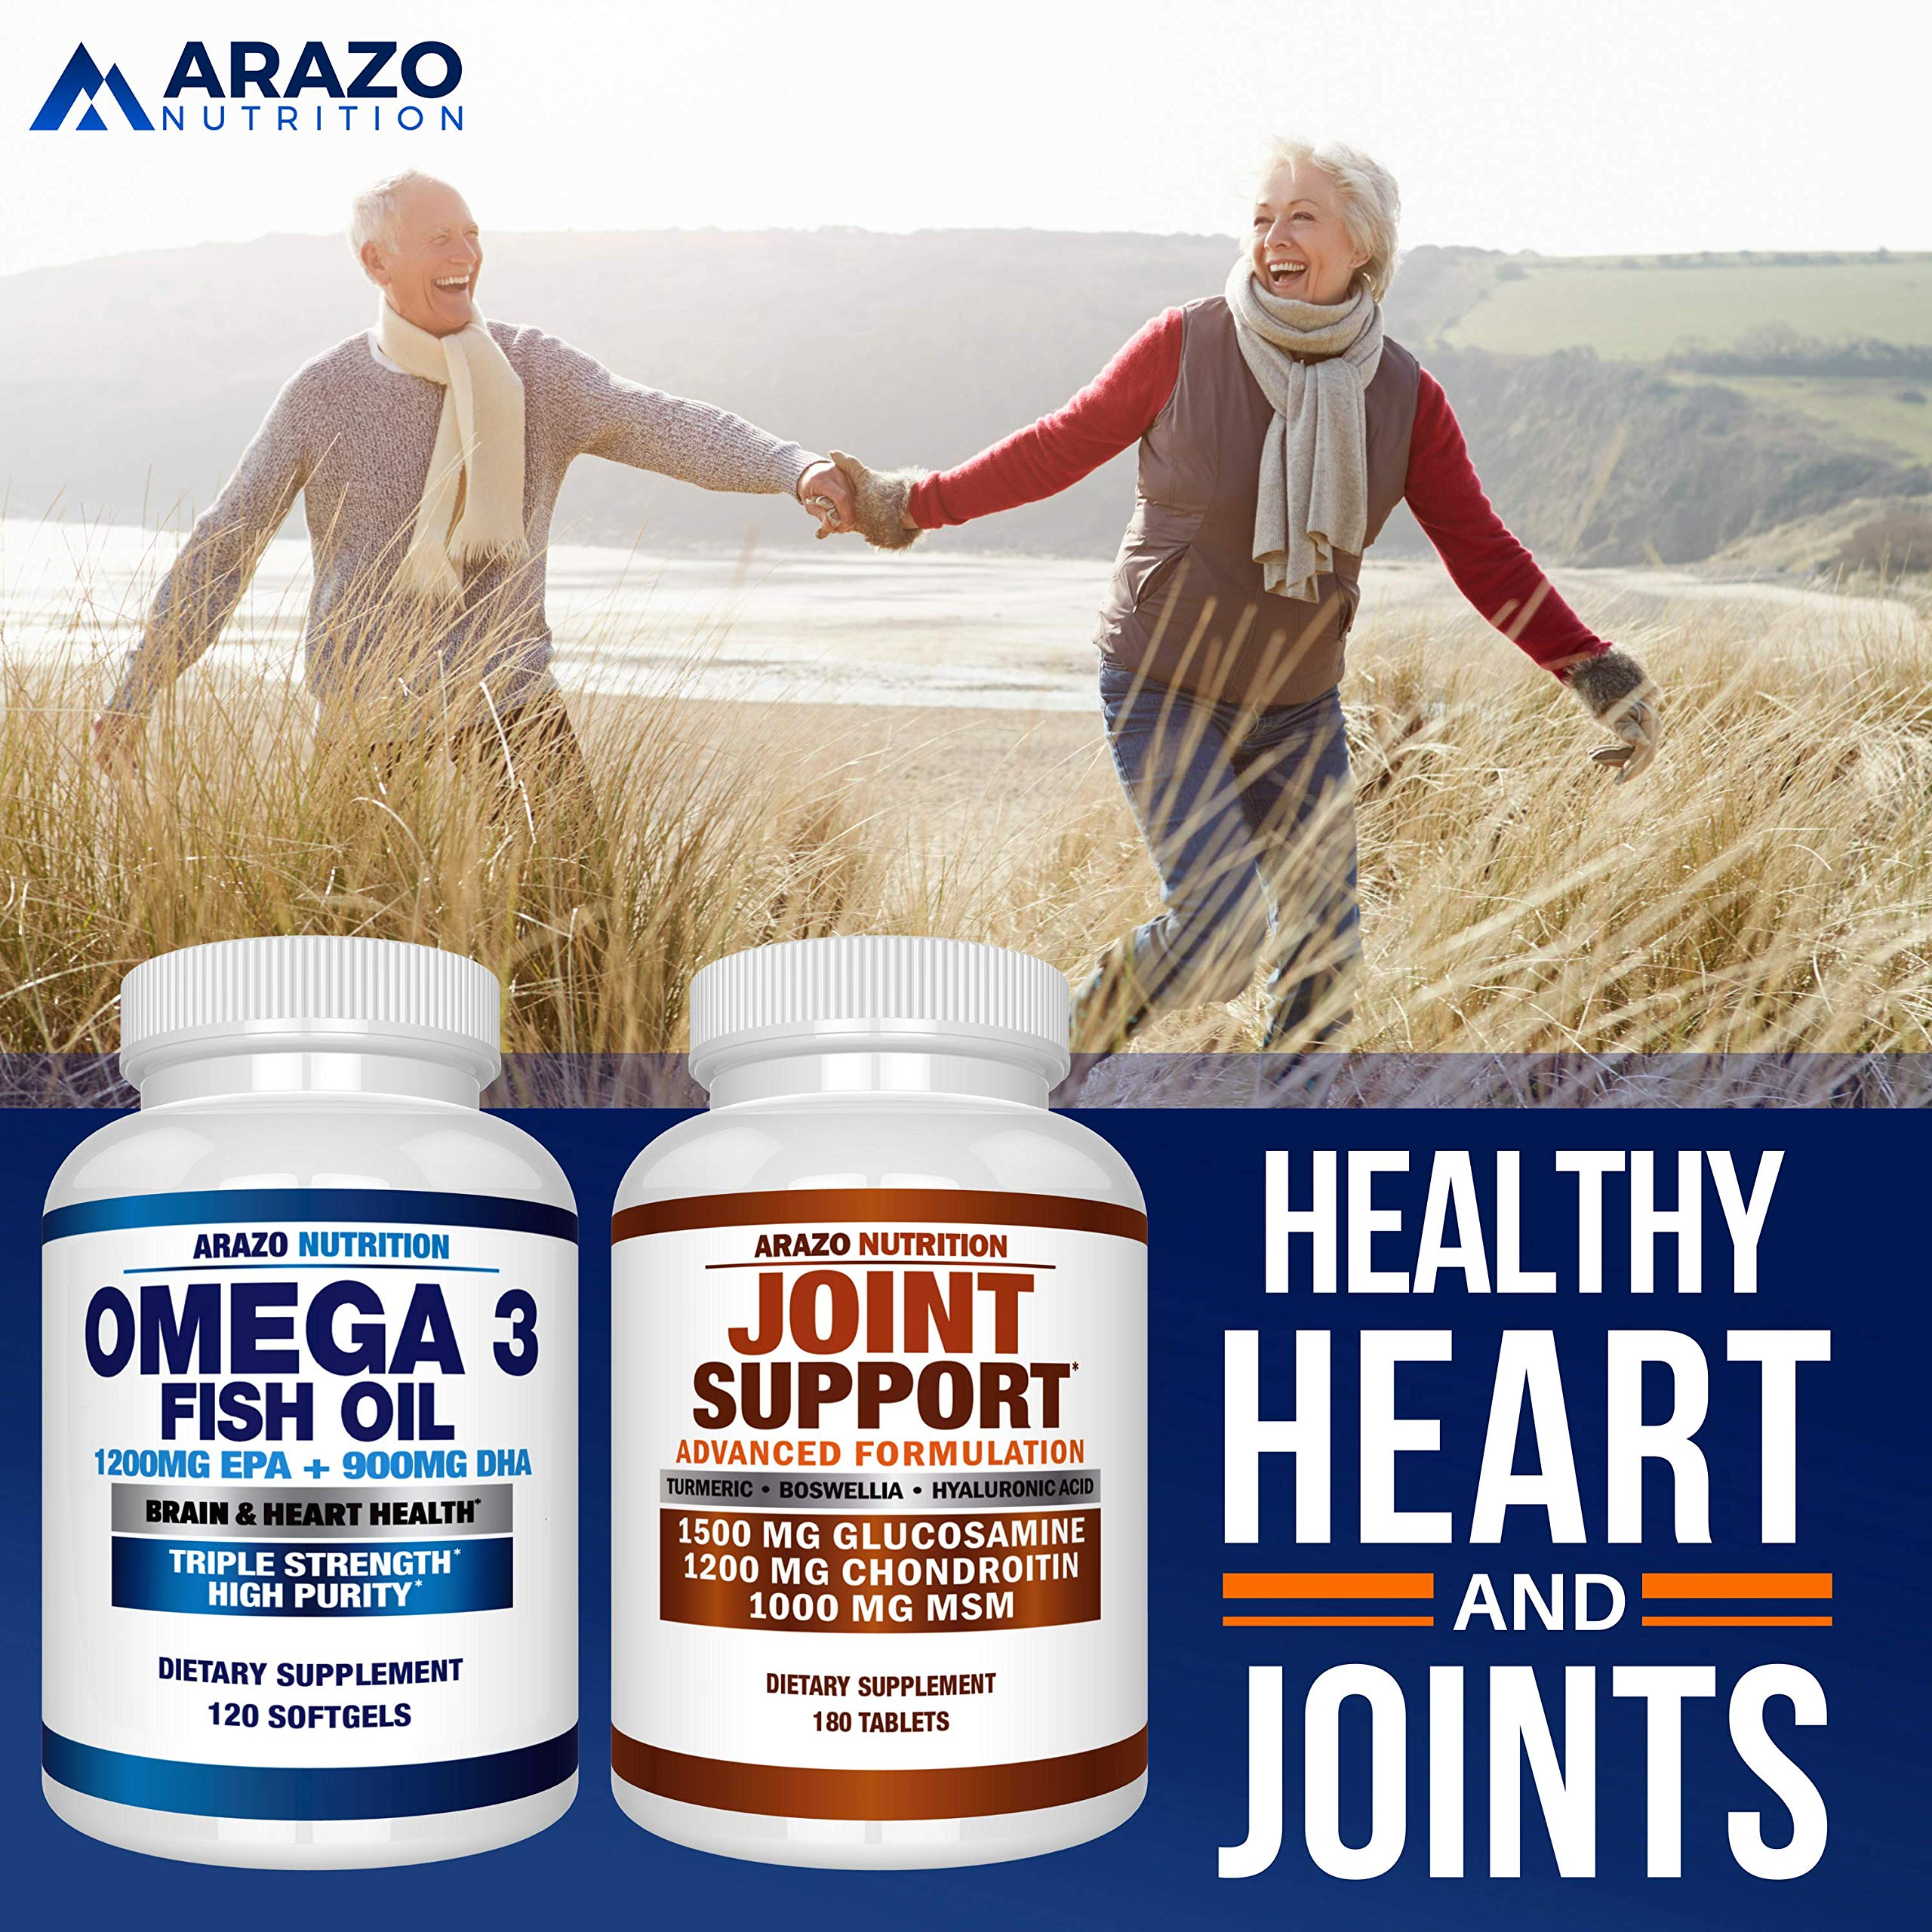 Omega 3 Fish Oil 2250mg   HIGH EPA 1200MG + DHA 900MG Triple Strength Burpless Capsules   120 Pills   Arazo Nutrition by Arazo Nutrition (Image #6)